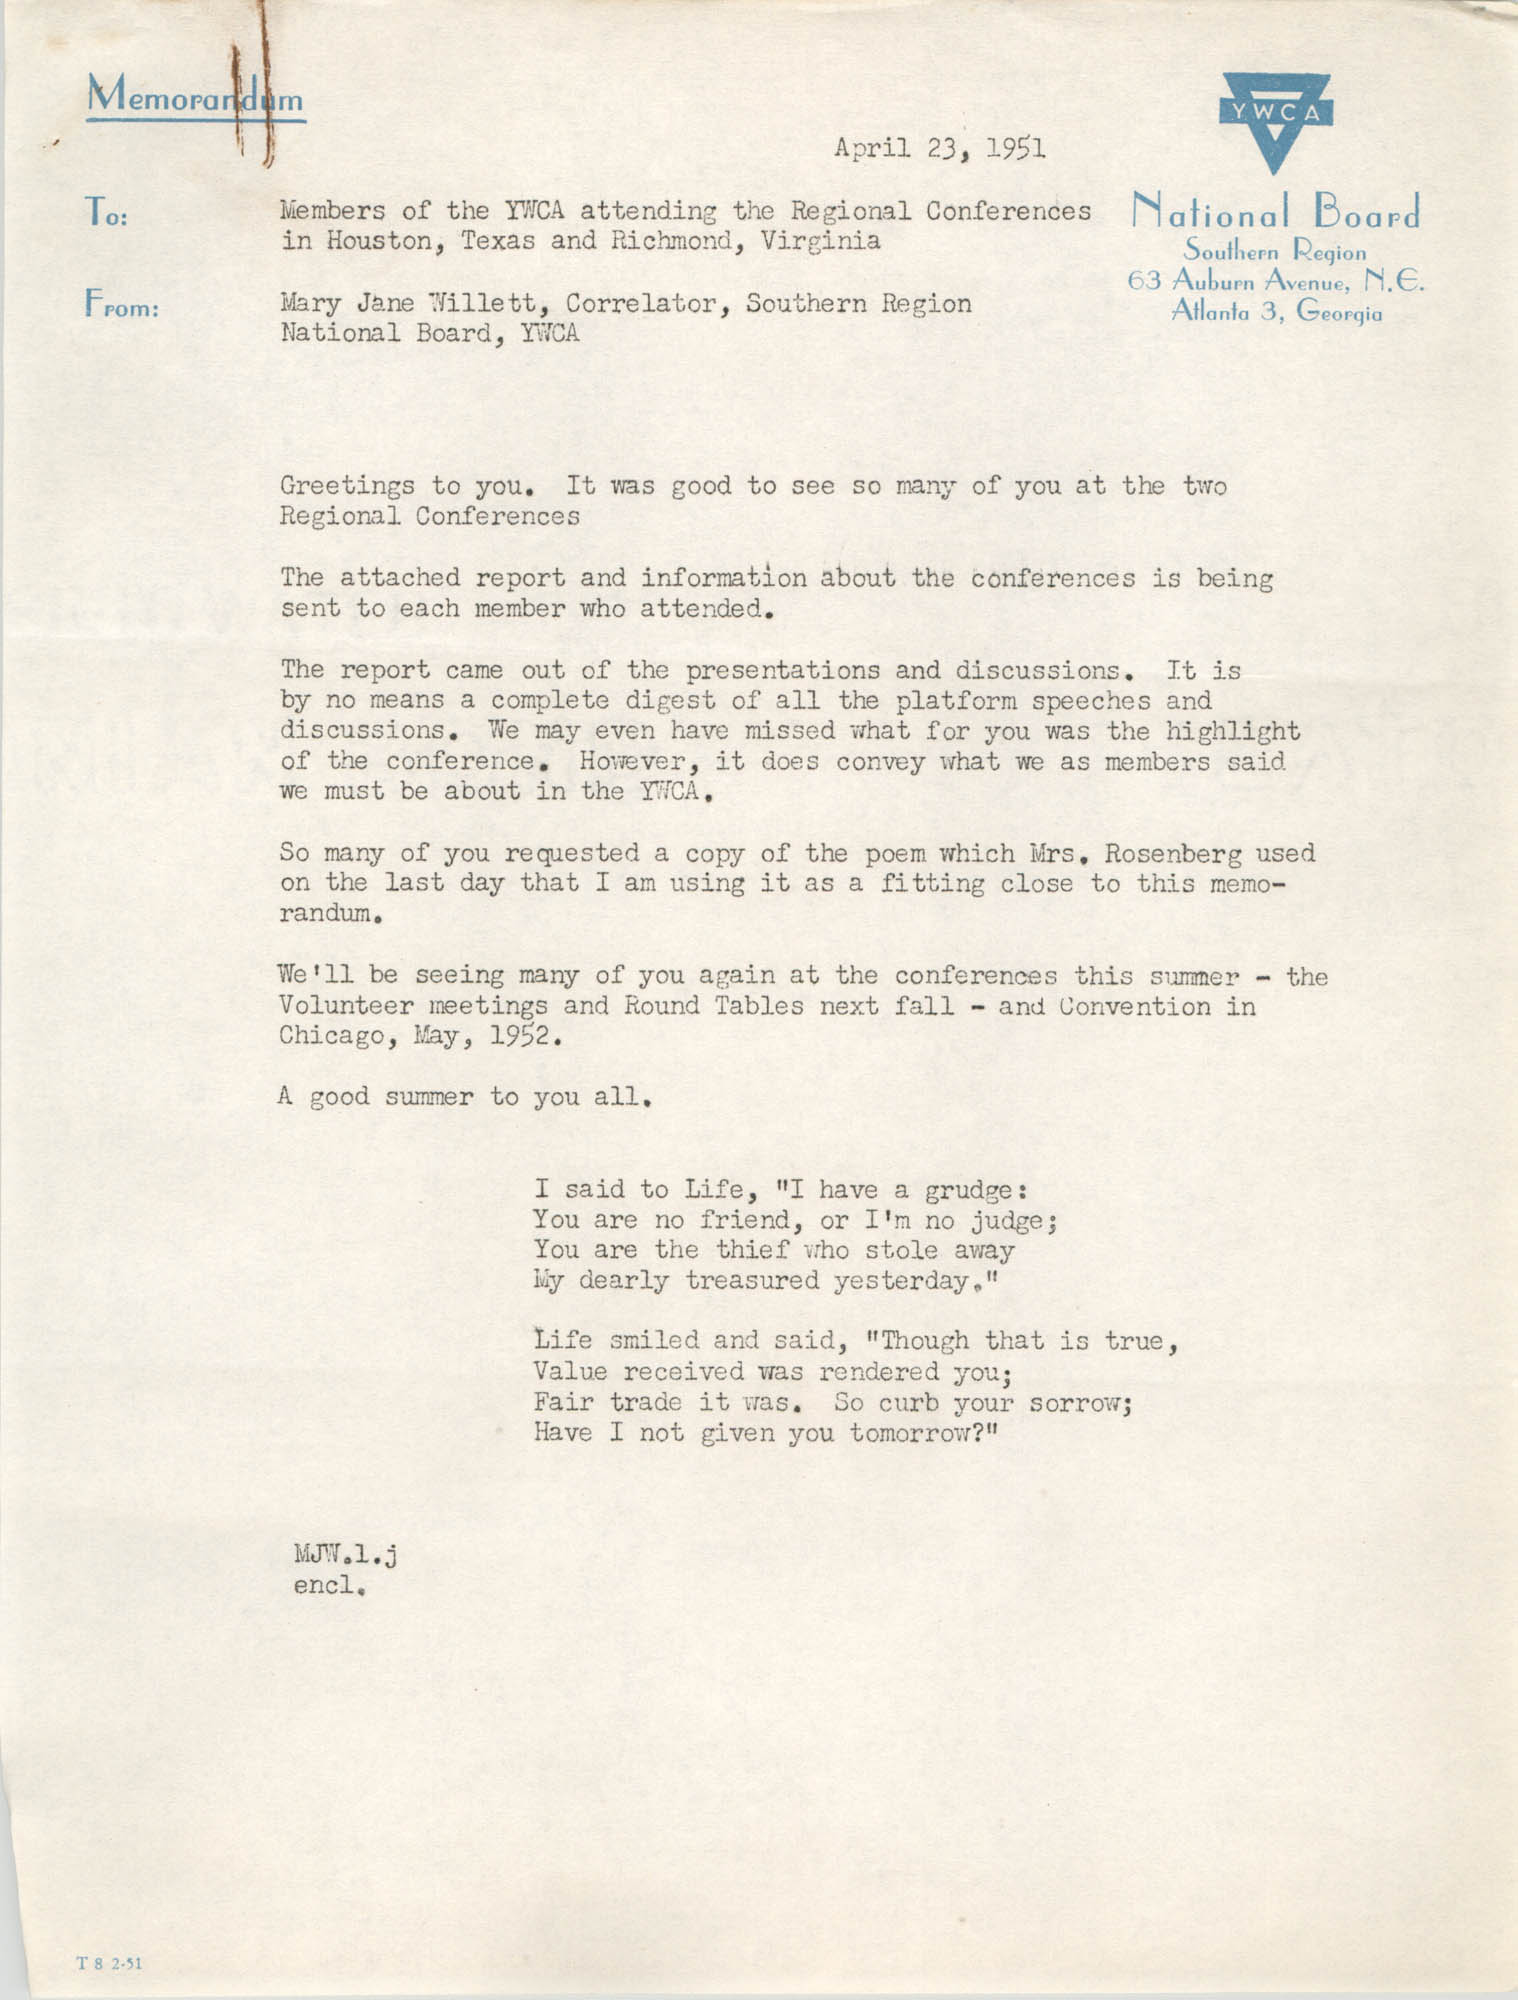 National Board of the Y.W.C.A. Memorandum, April 23, 1951